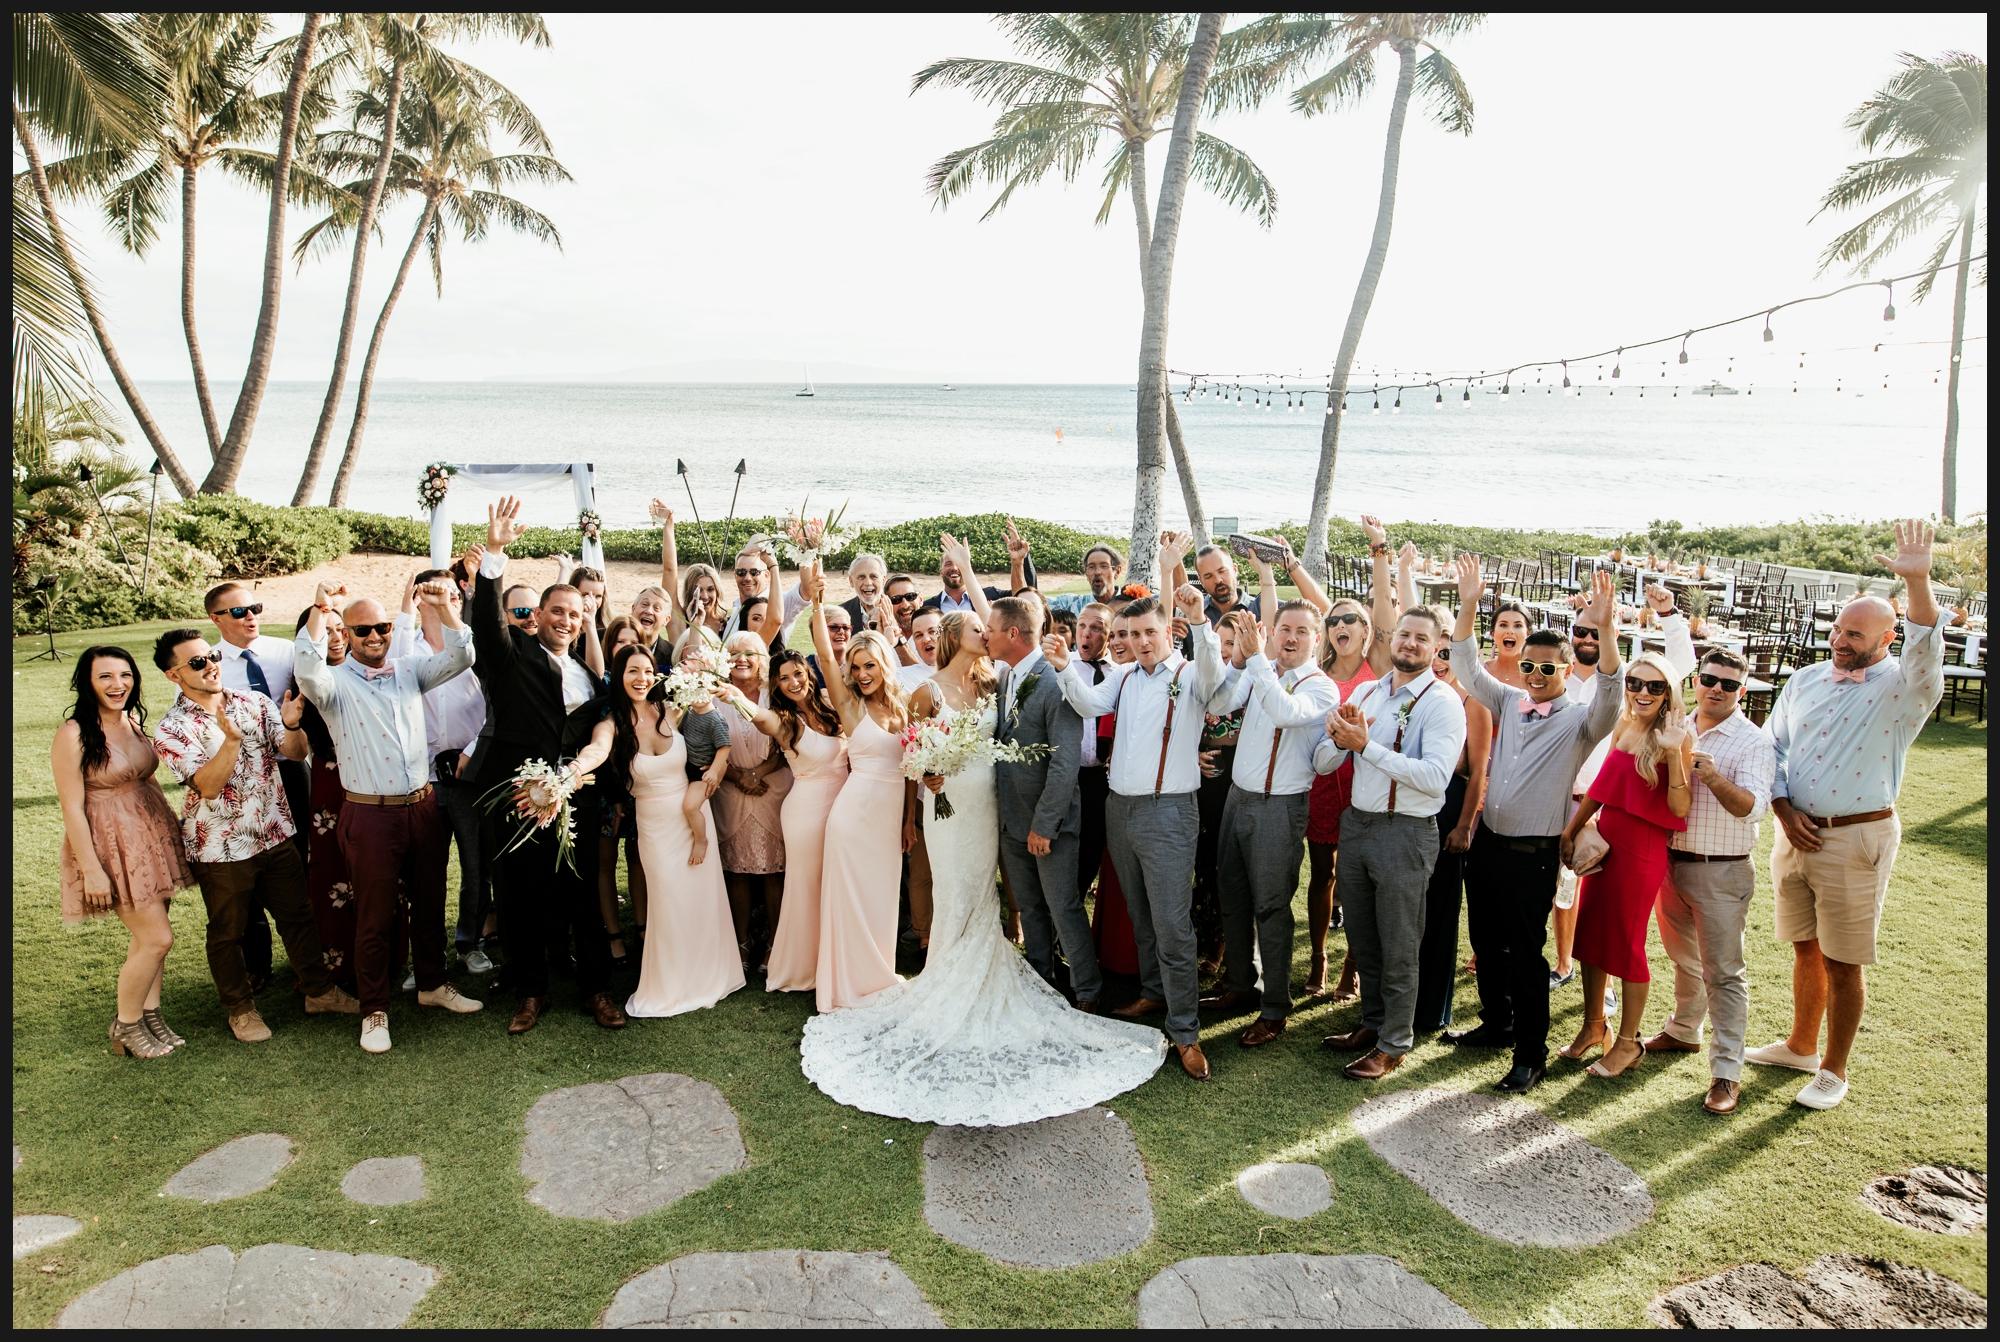 Orlando-Wedding-Photographer-destination-wedding-photographer-florida-wedding-photographer-hawaii-wedding-photographer_0066.jpg